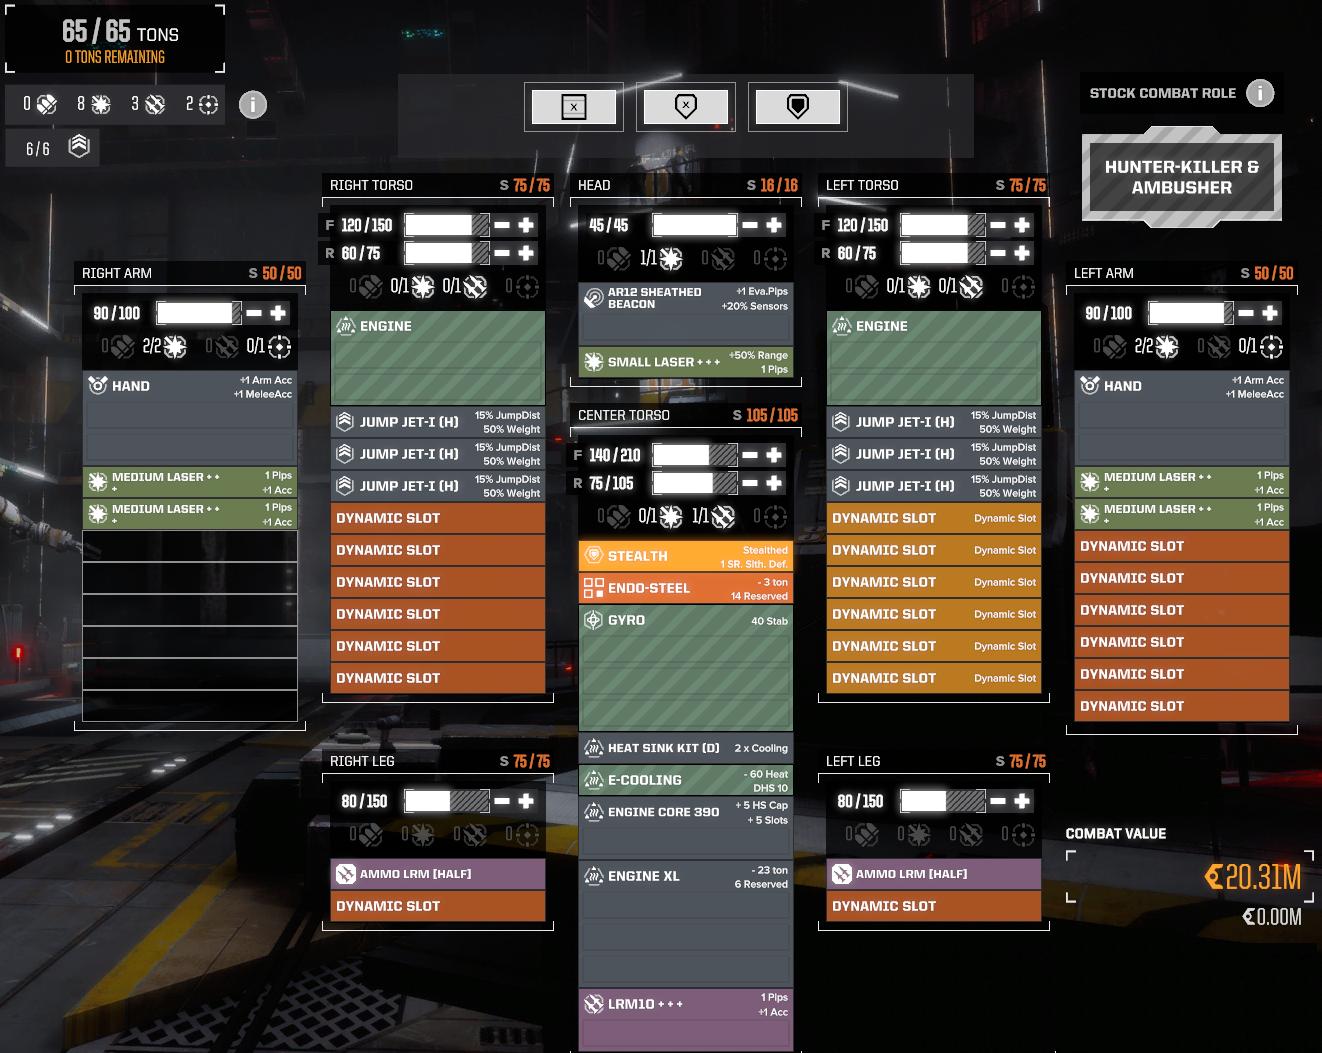 Exterminator-ext-4d.png